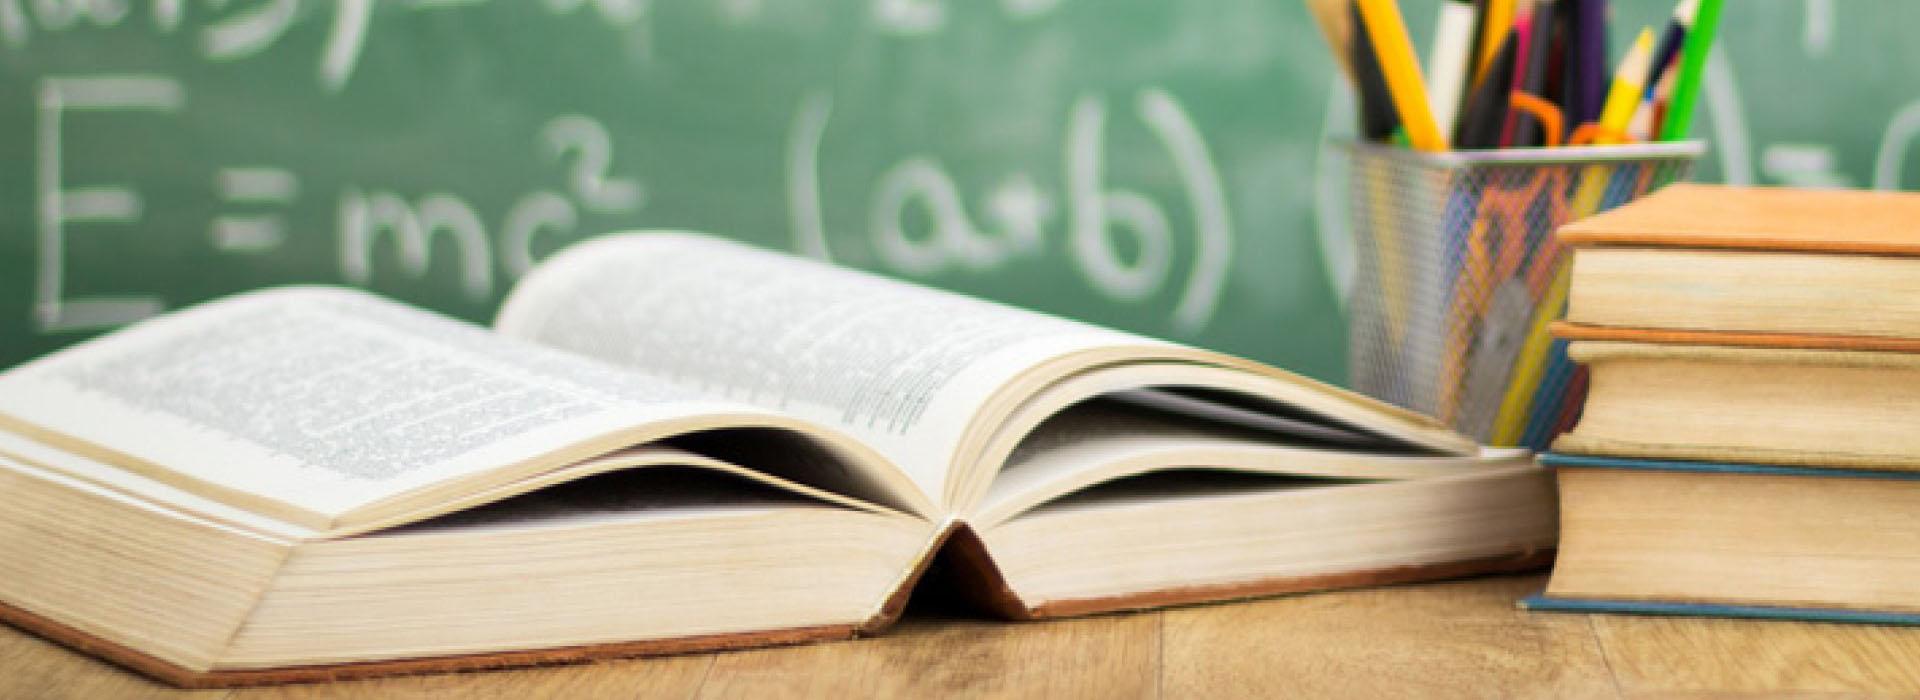 education-1920x700